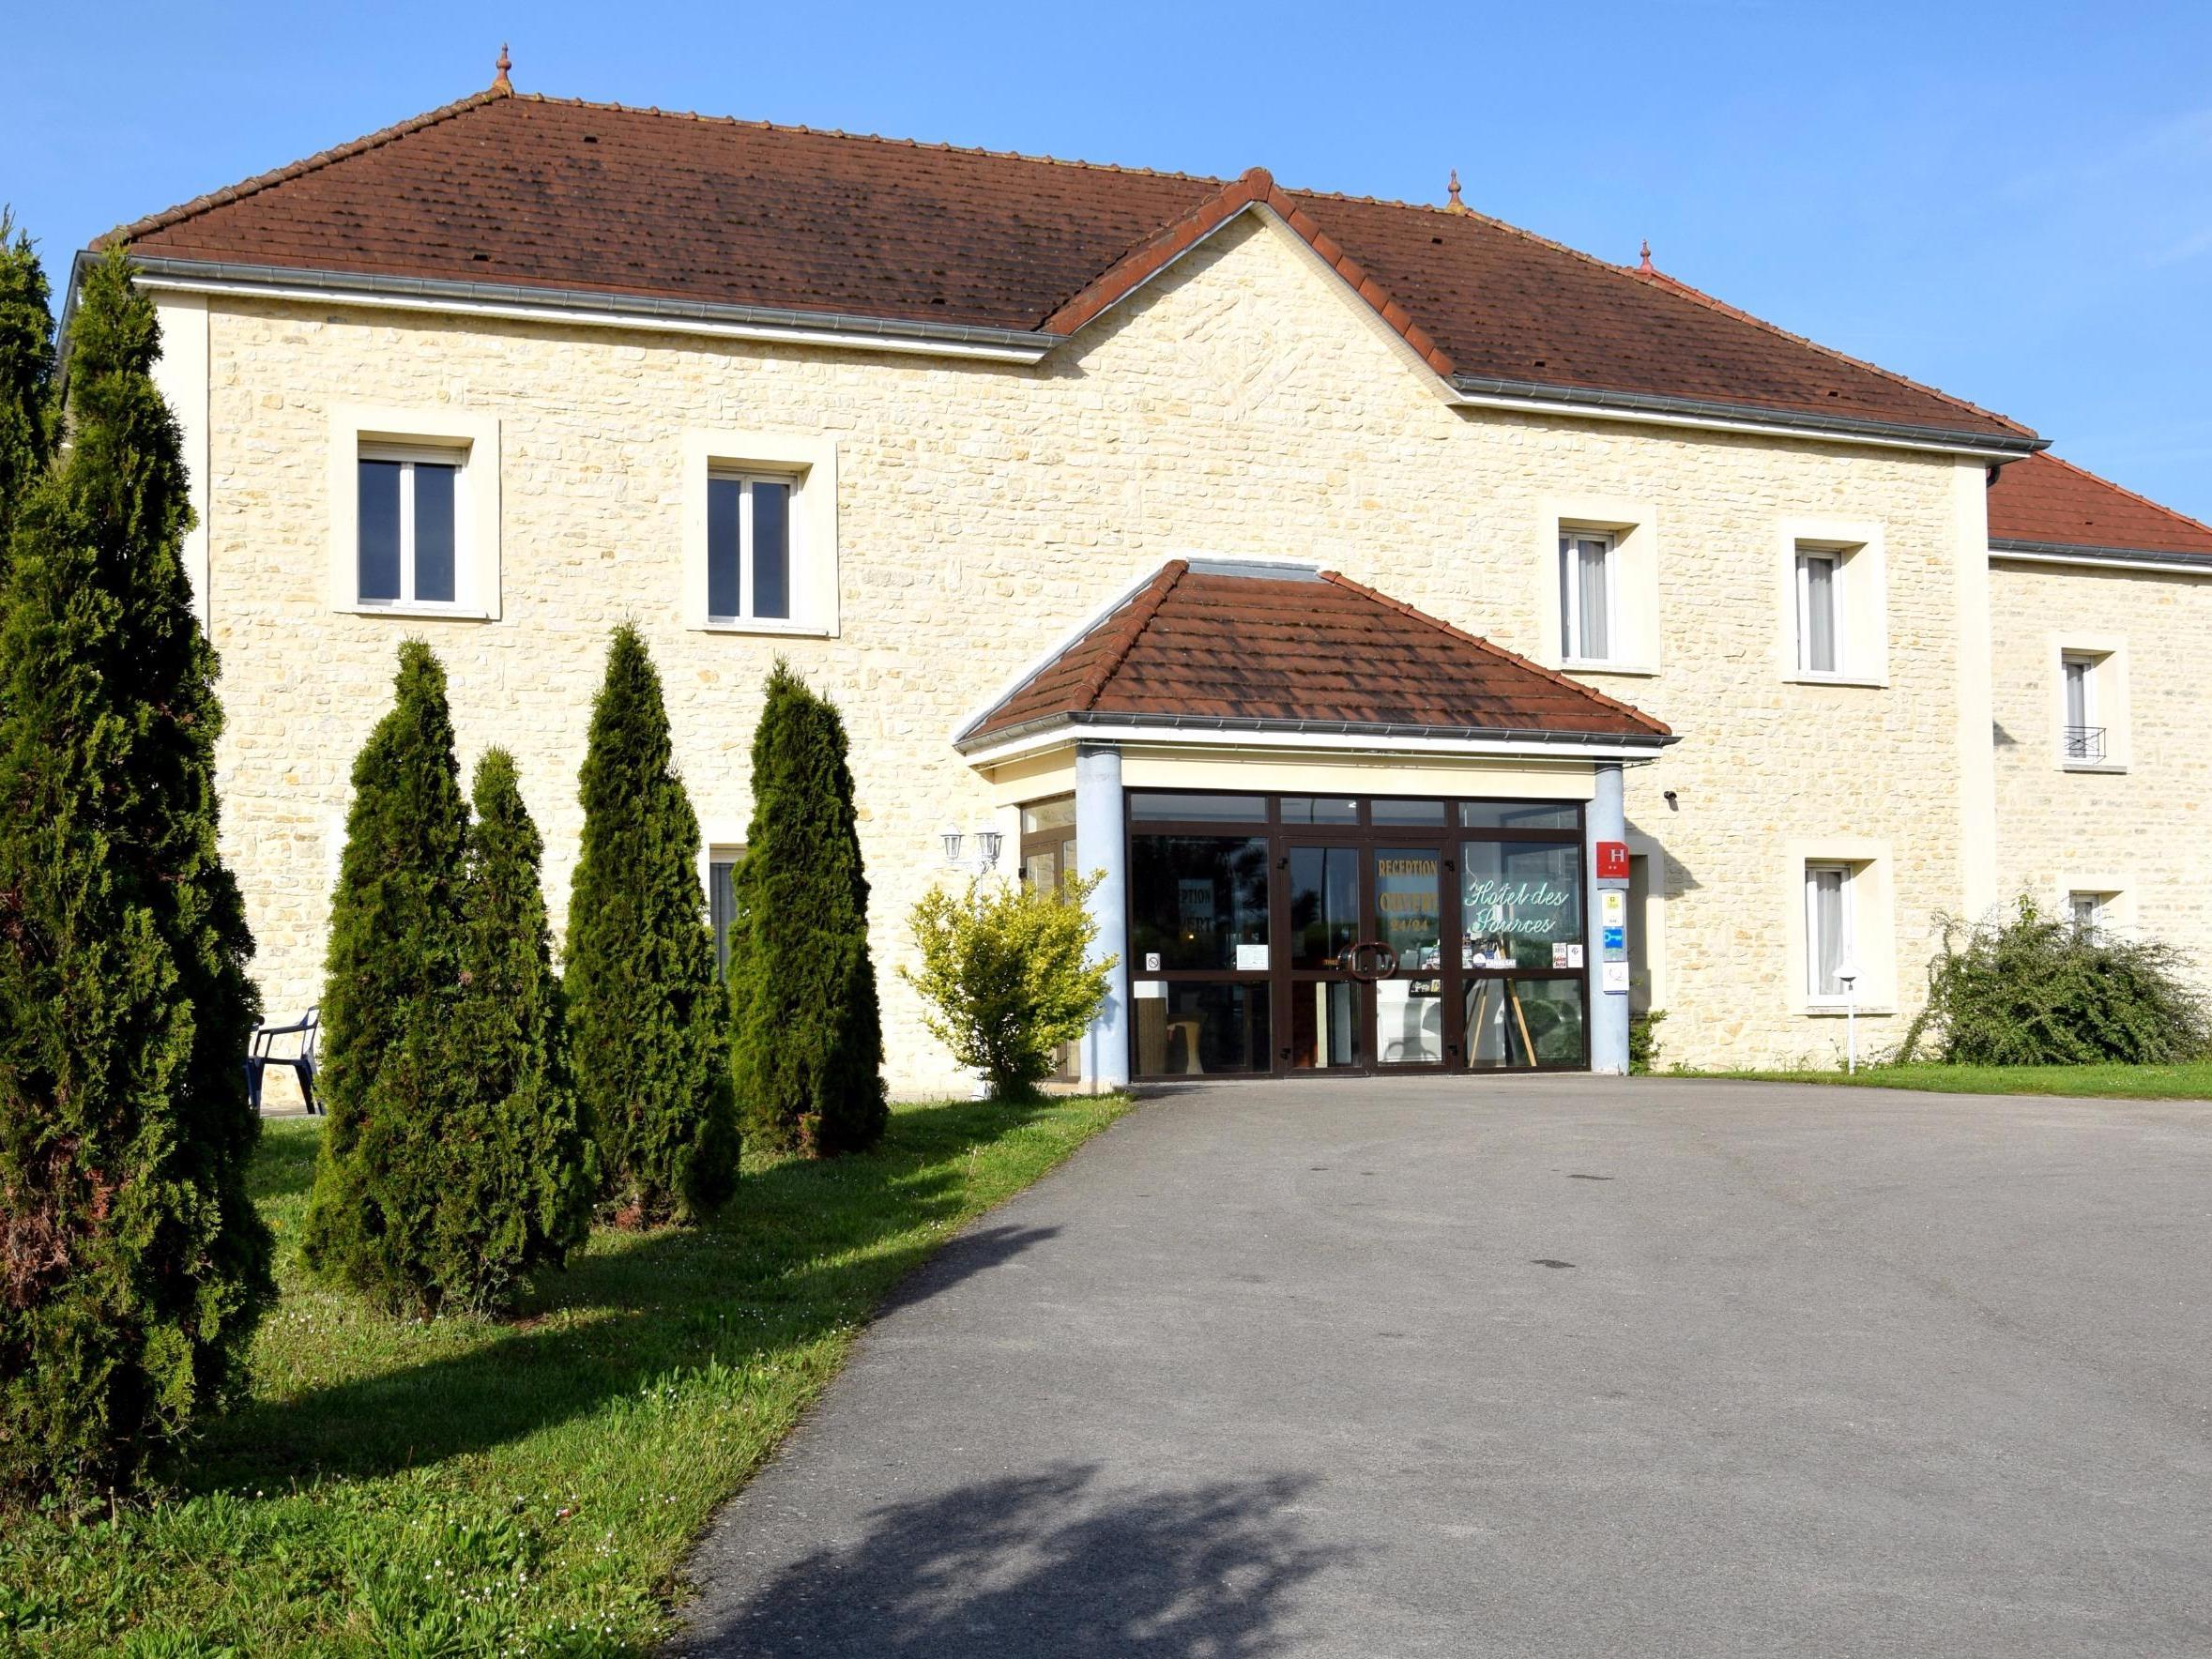 Hôtel des sources hôtel logis creney pres troyes aufenthalt